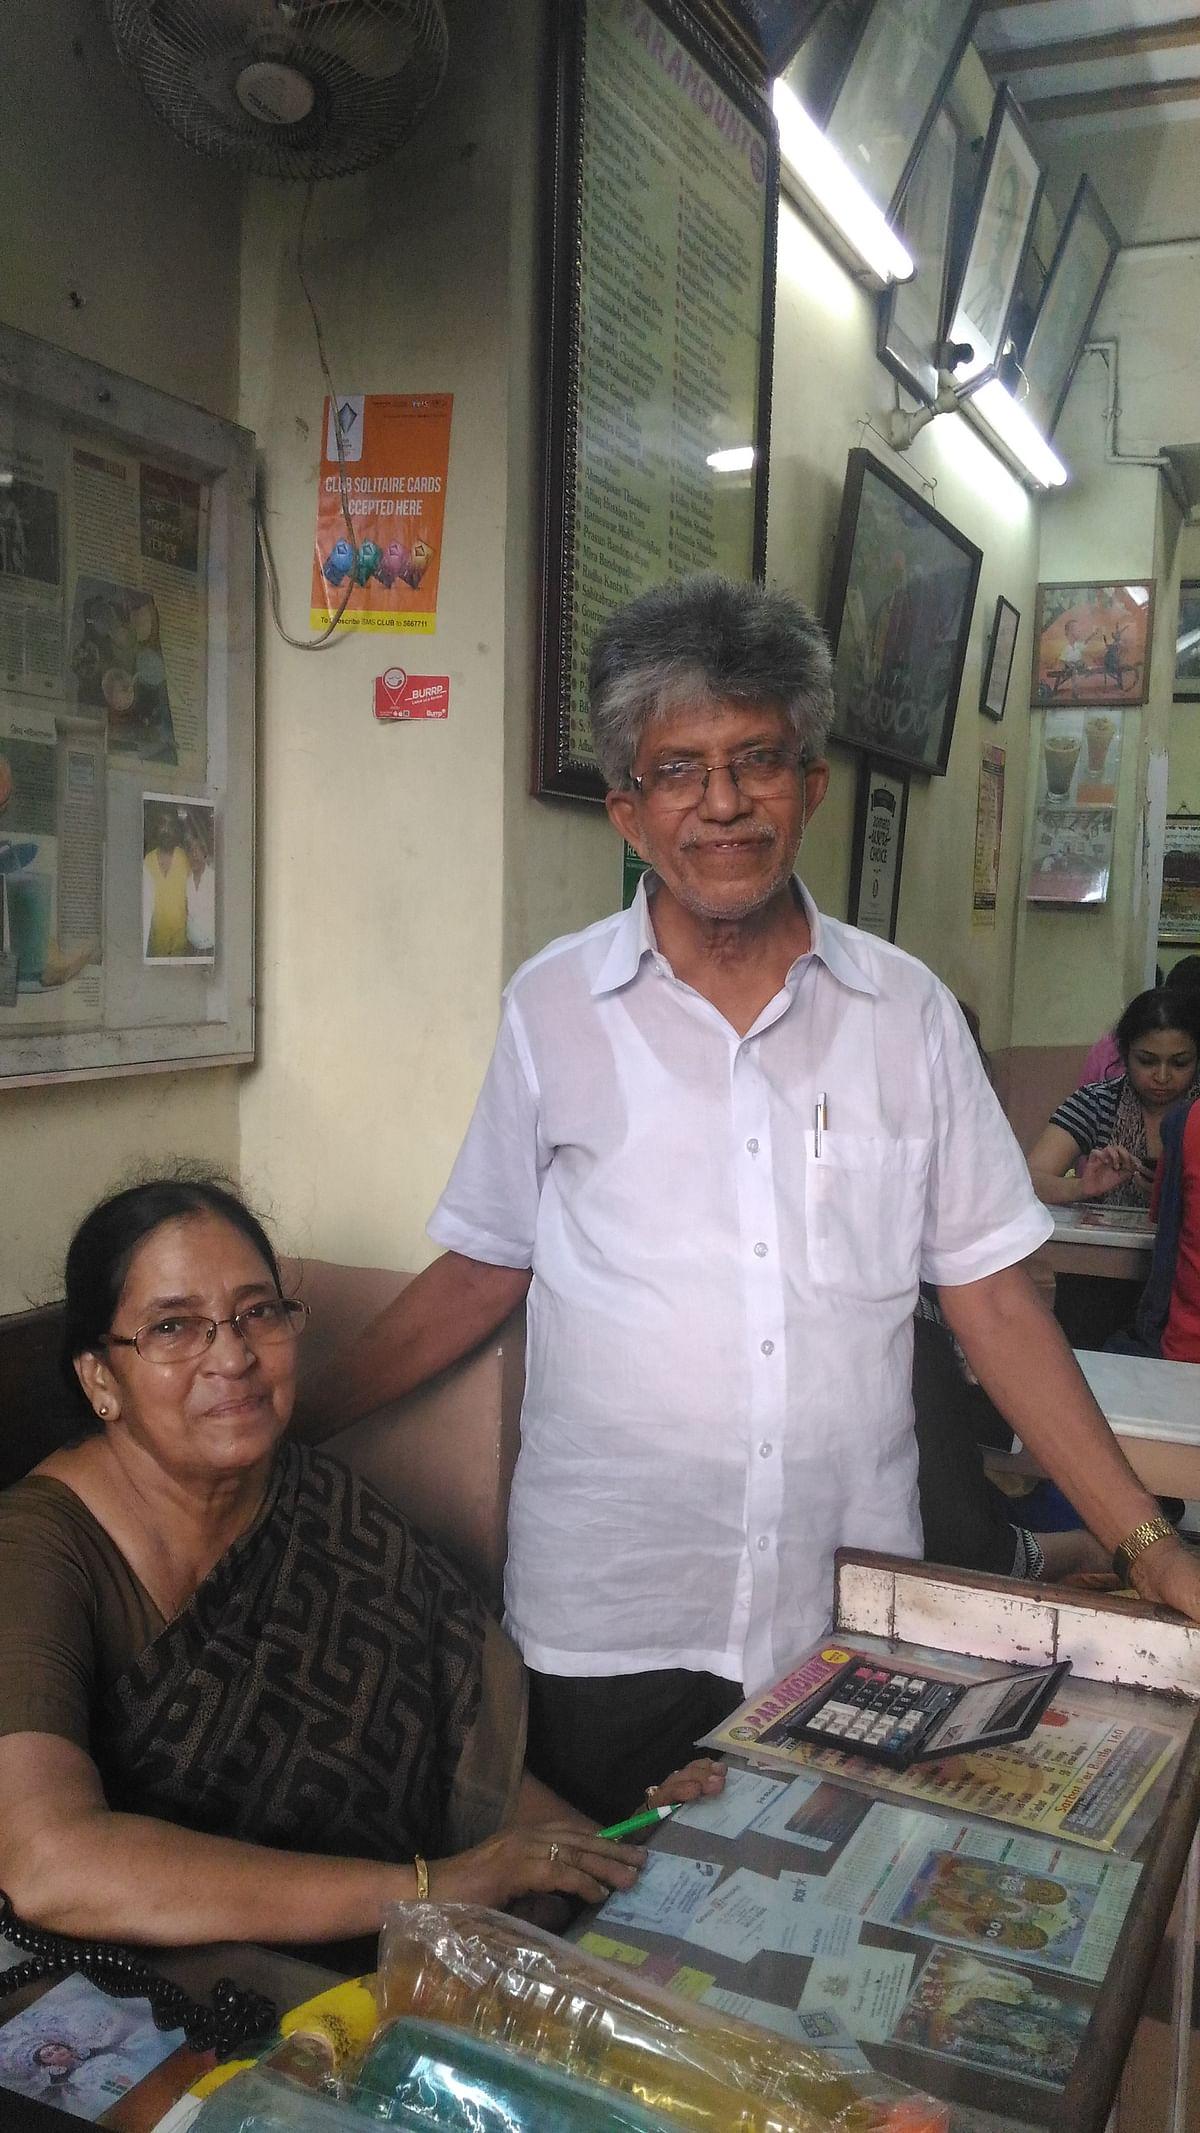 Mrigendra Majumdar and his sister. (Photo: Roshni Sinha)